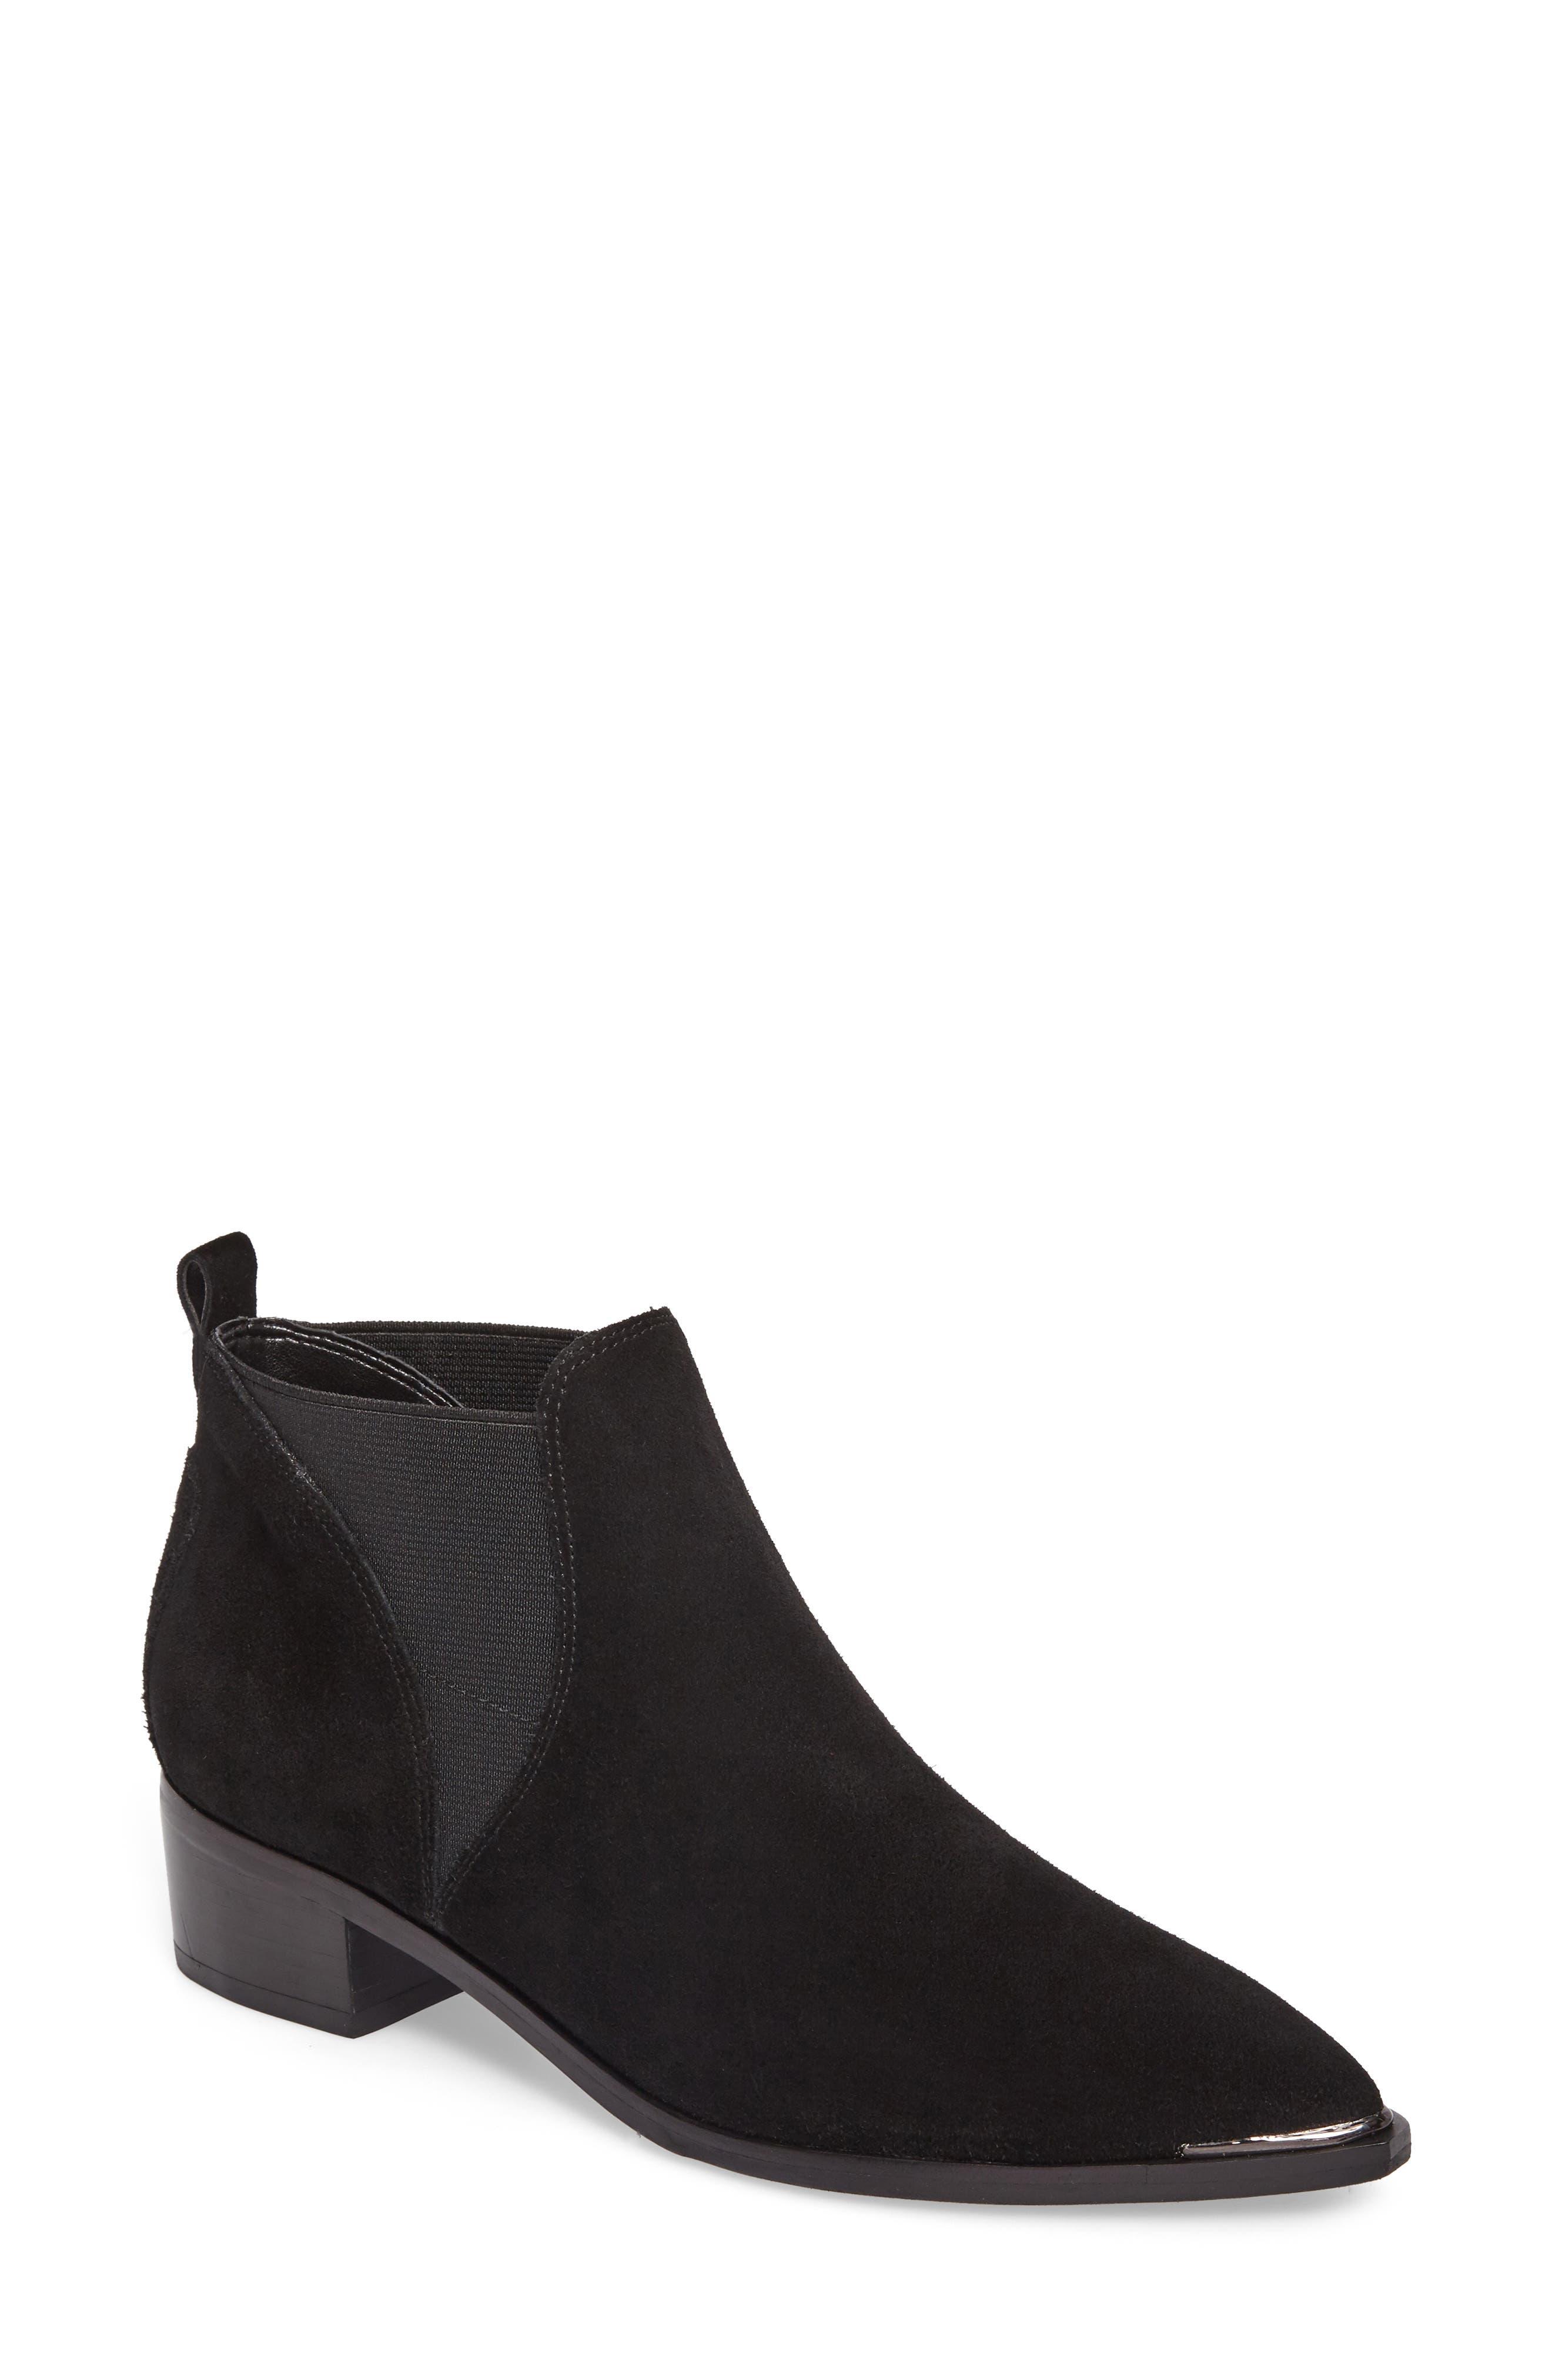 Alternate Image 1 Selected - Marc Fisher LTD Yellin Pointy Toe Chelsea Boot (Women)